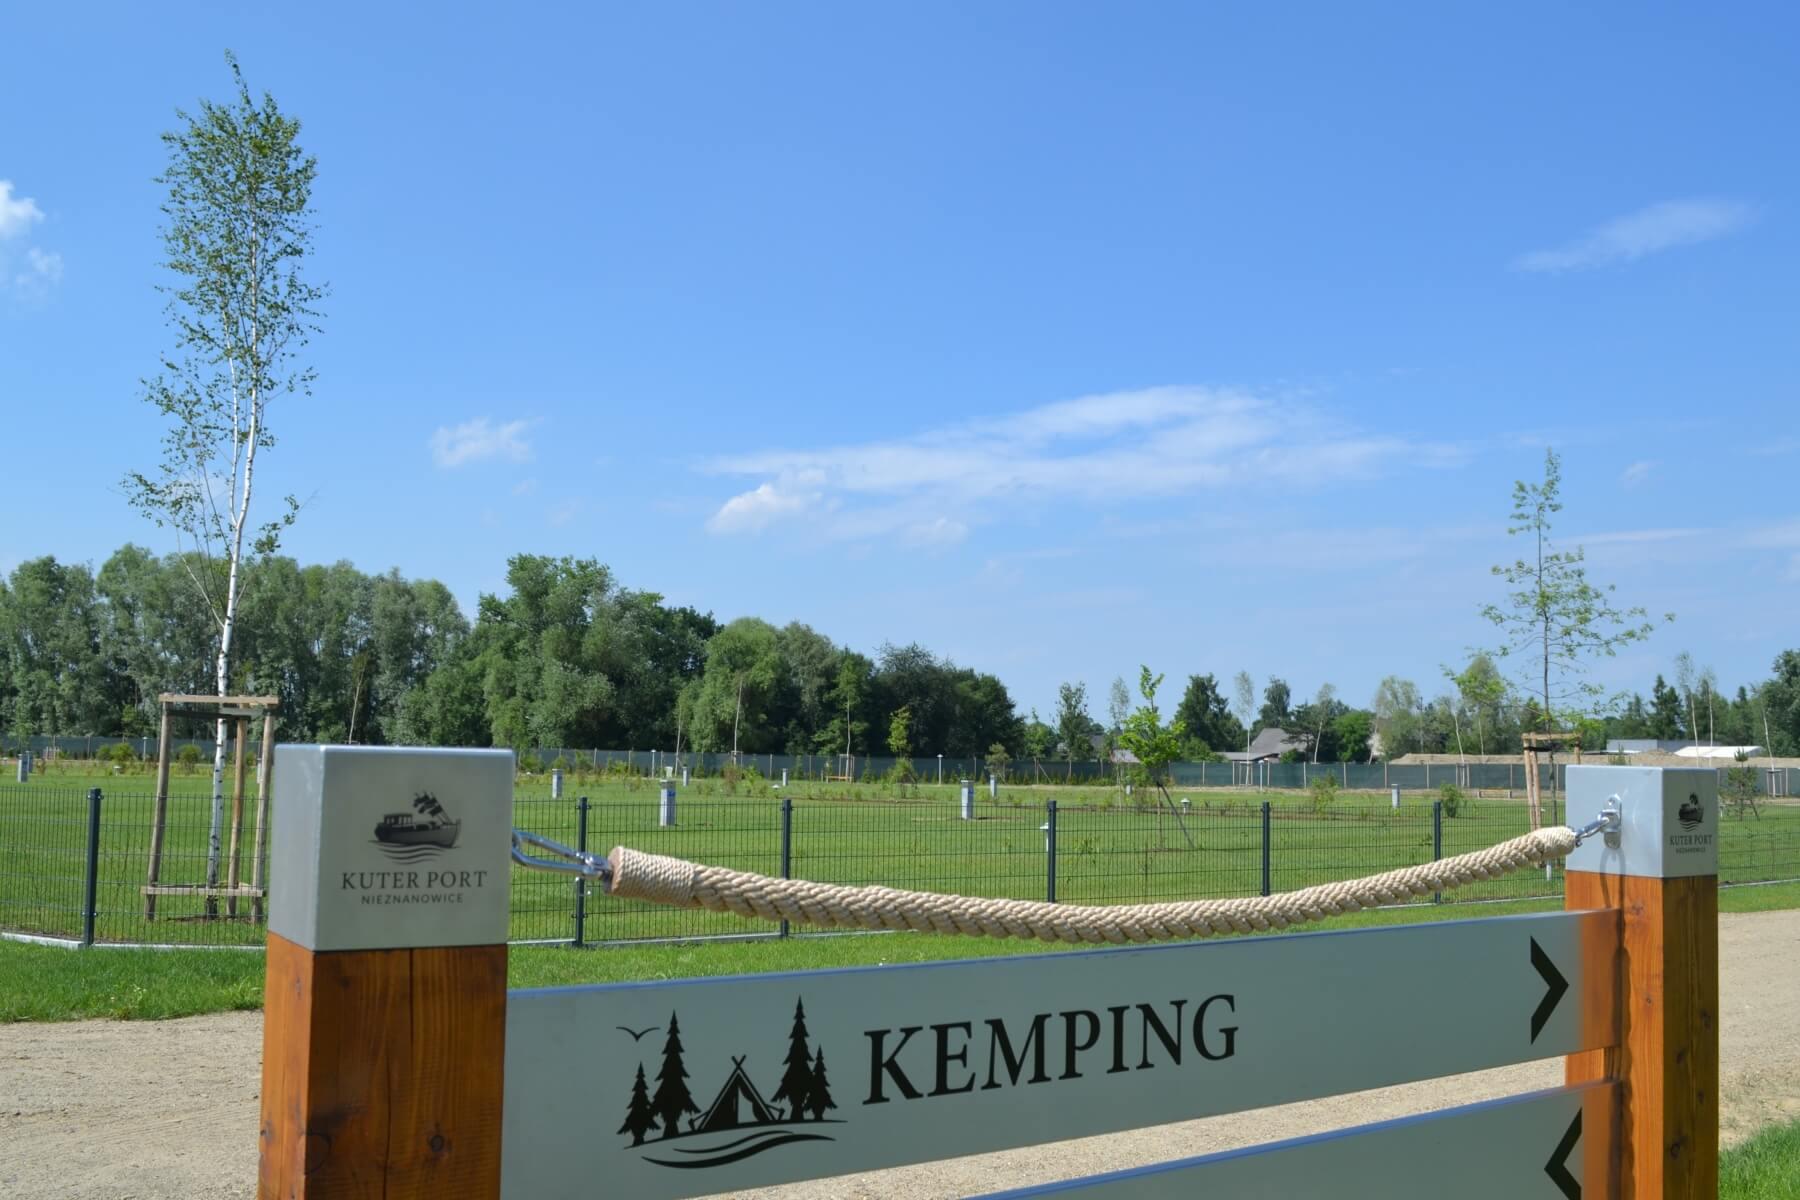 Kemping – nowa strefa Kuter Portu